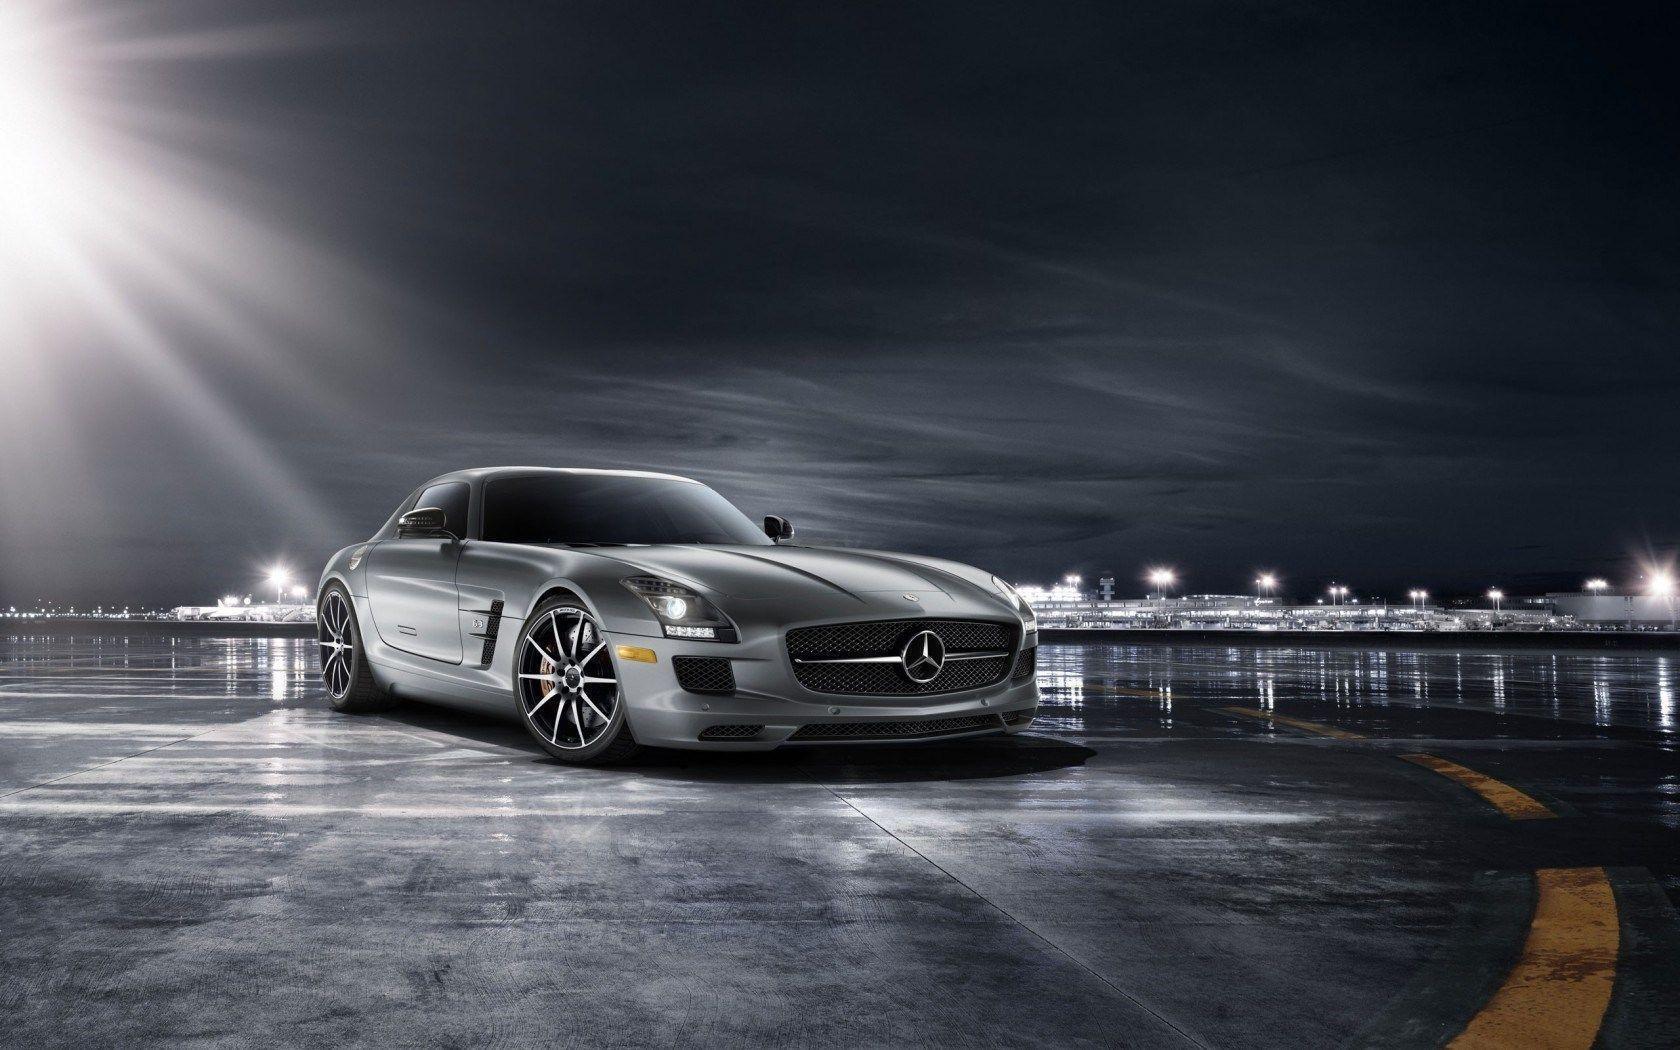 Mercedes Benz AMG Wallpapers 1680x1050